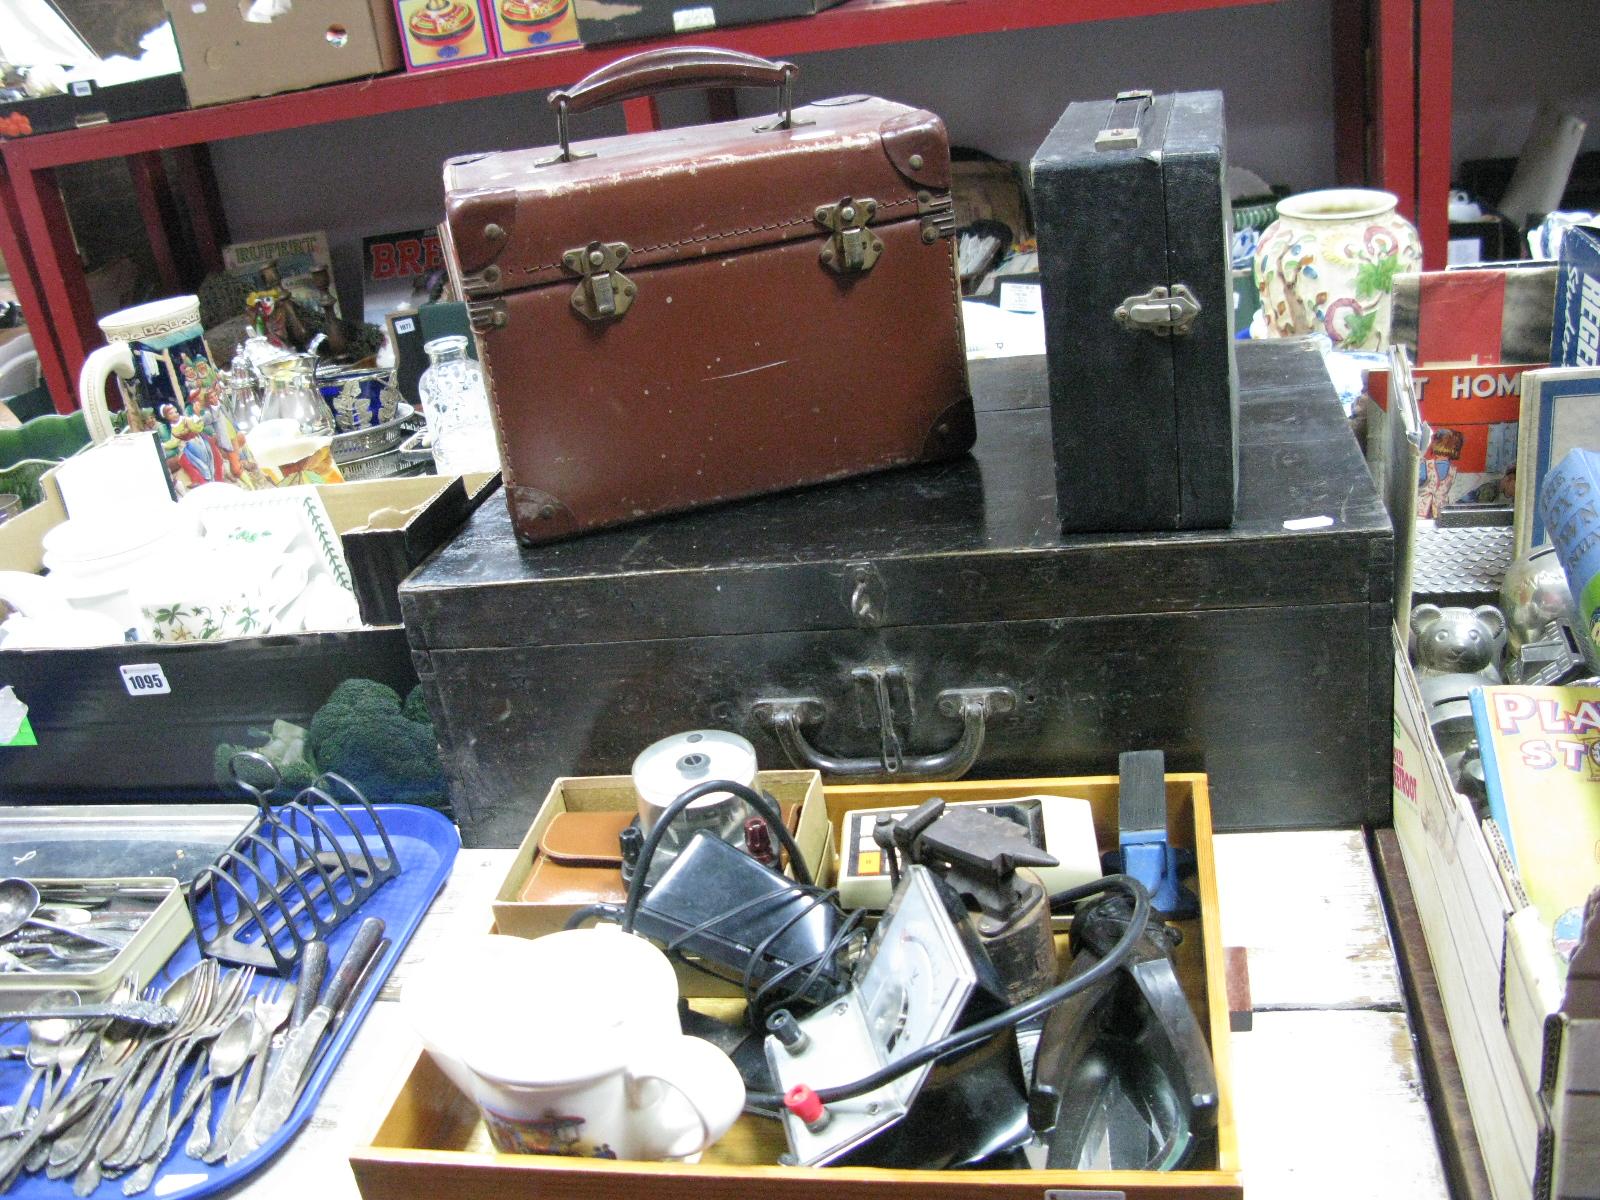 Lot 1094 - A Child's Cased Sewing Machine, tool box, cutthroat razor, novelty nutcrackers, Datamatch